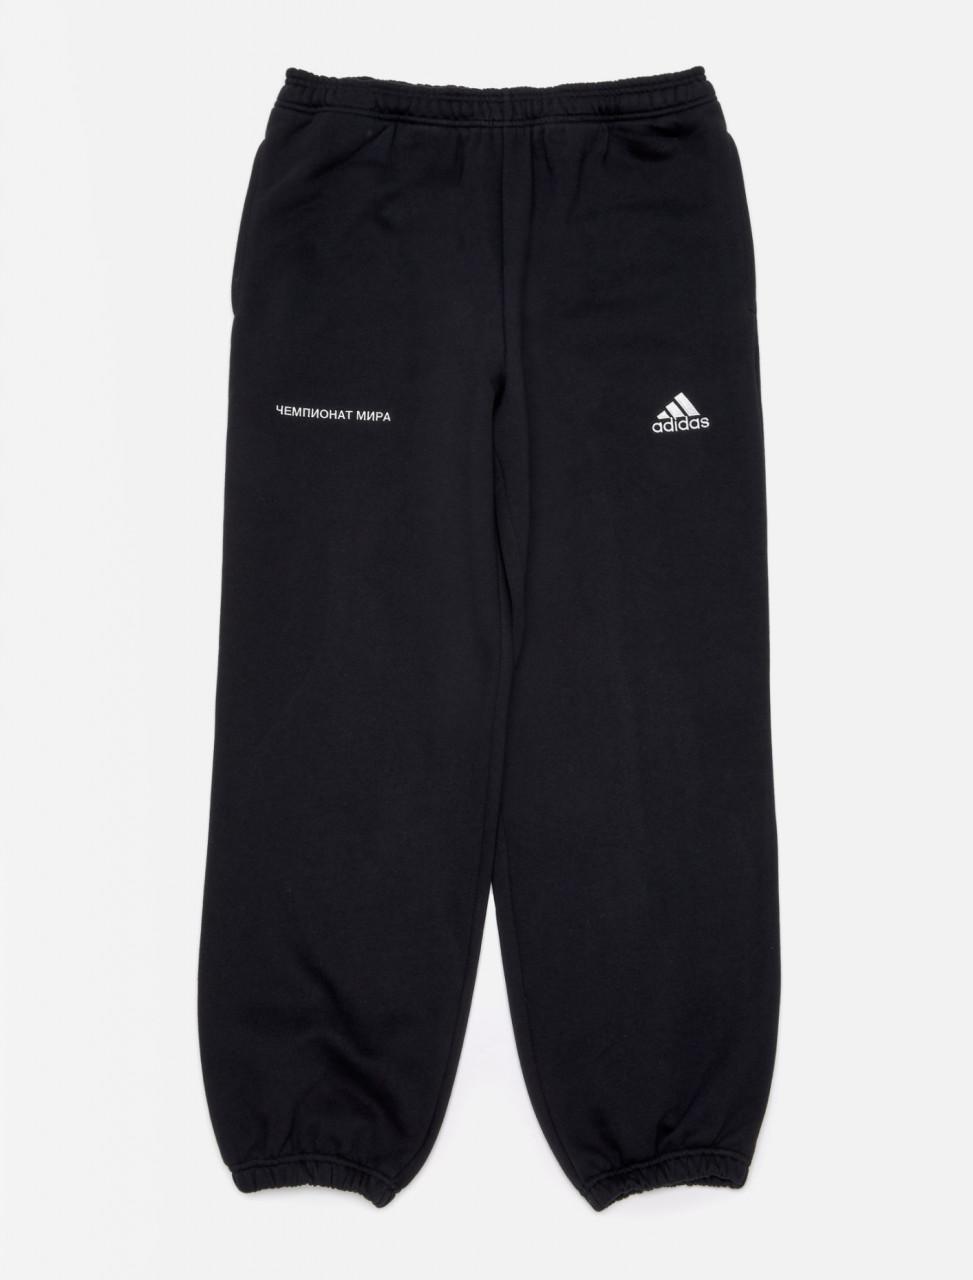 Adidas x Gosha Rubchinskiy Sweatpants